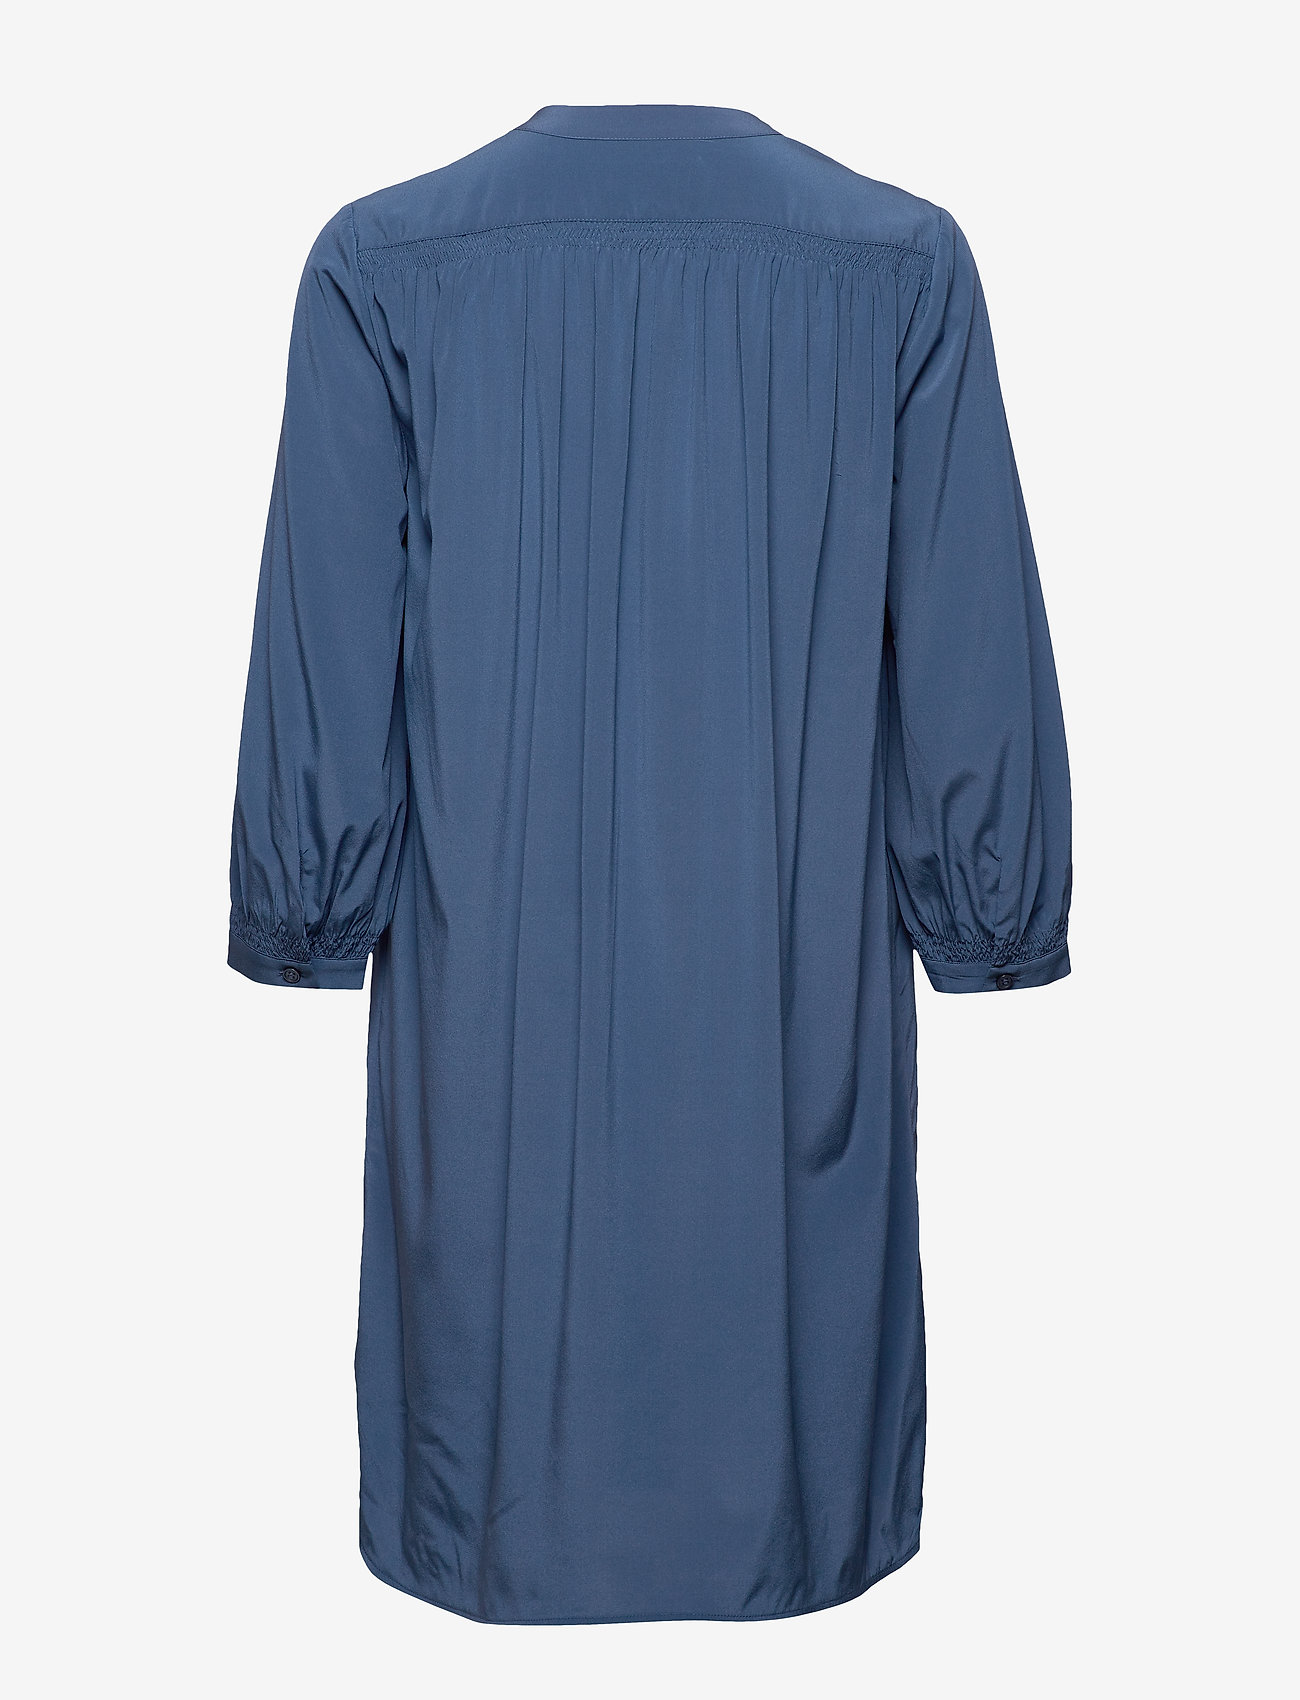 SAND CDC Stretch - Dinora DG - Bluser & Skjorter MEDIUM BLUE - Dameklær Spesialtilbud